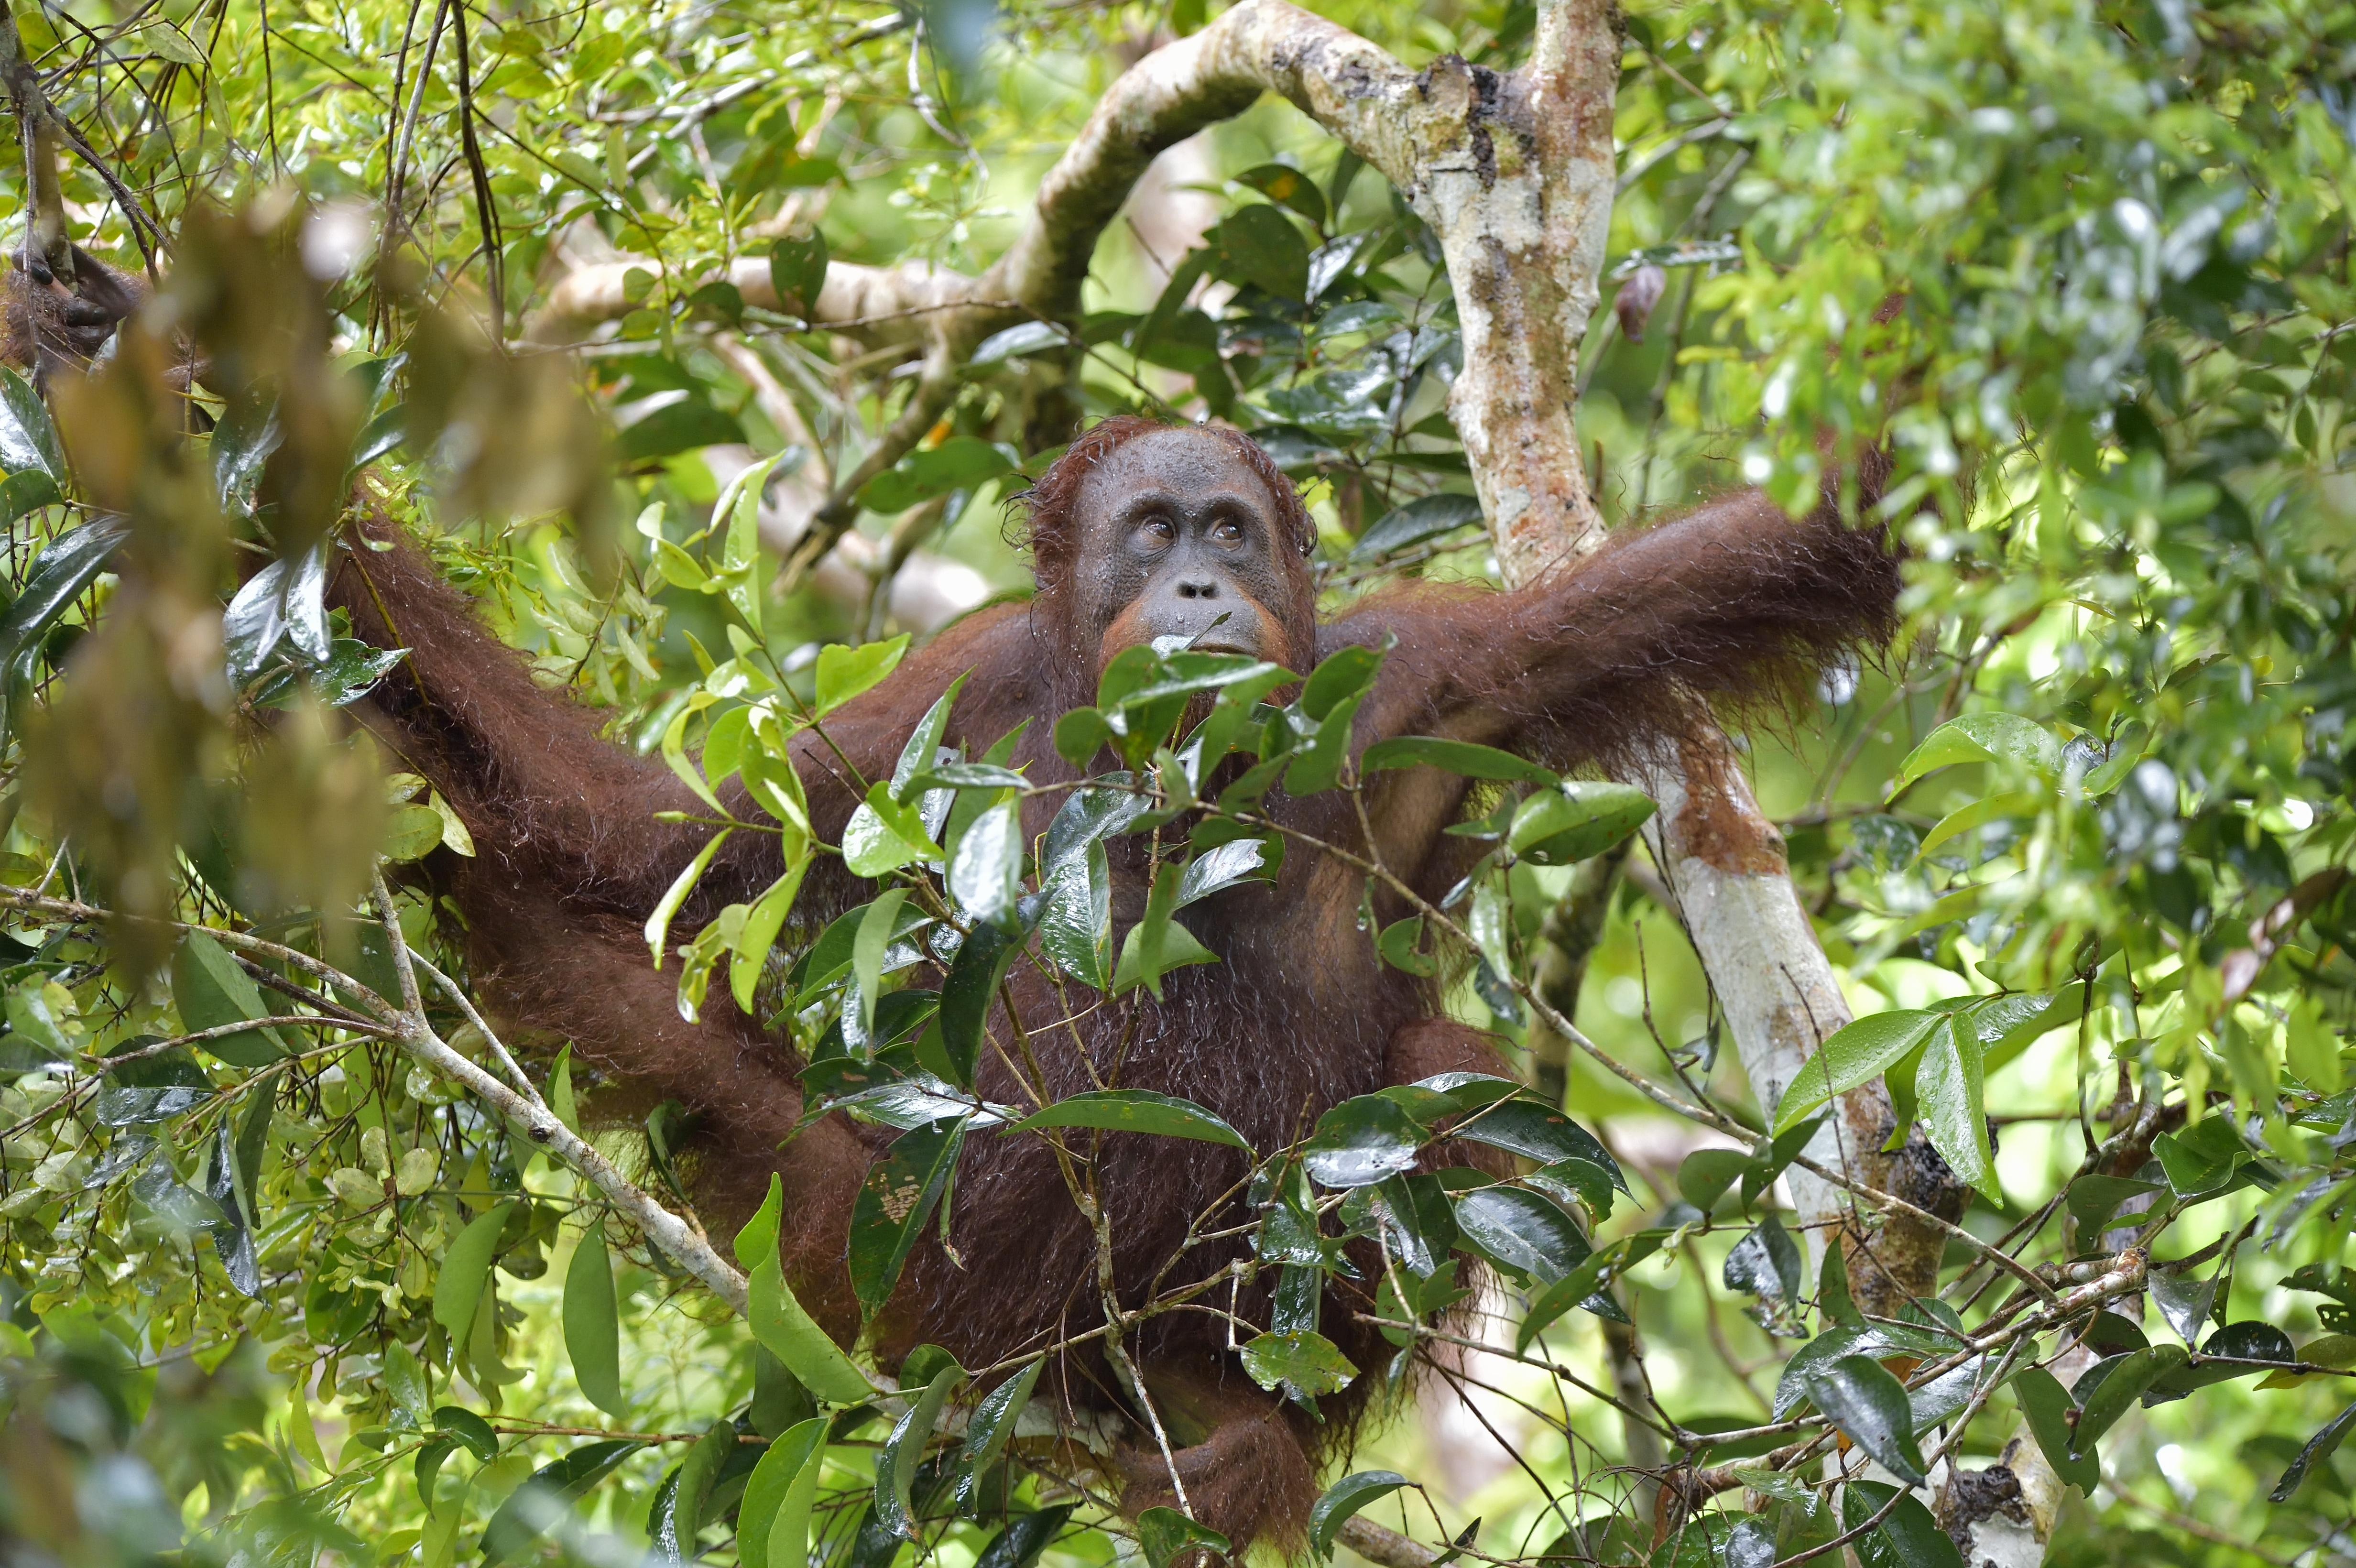 Article image for Orangutan escapes enclosure, sending Melbourne Zoo into lockdown